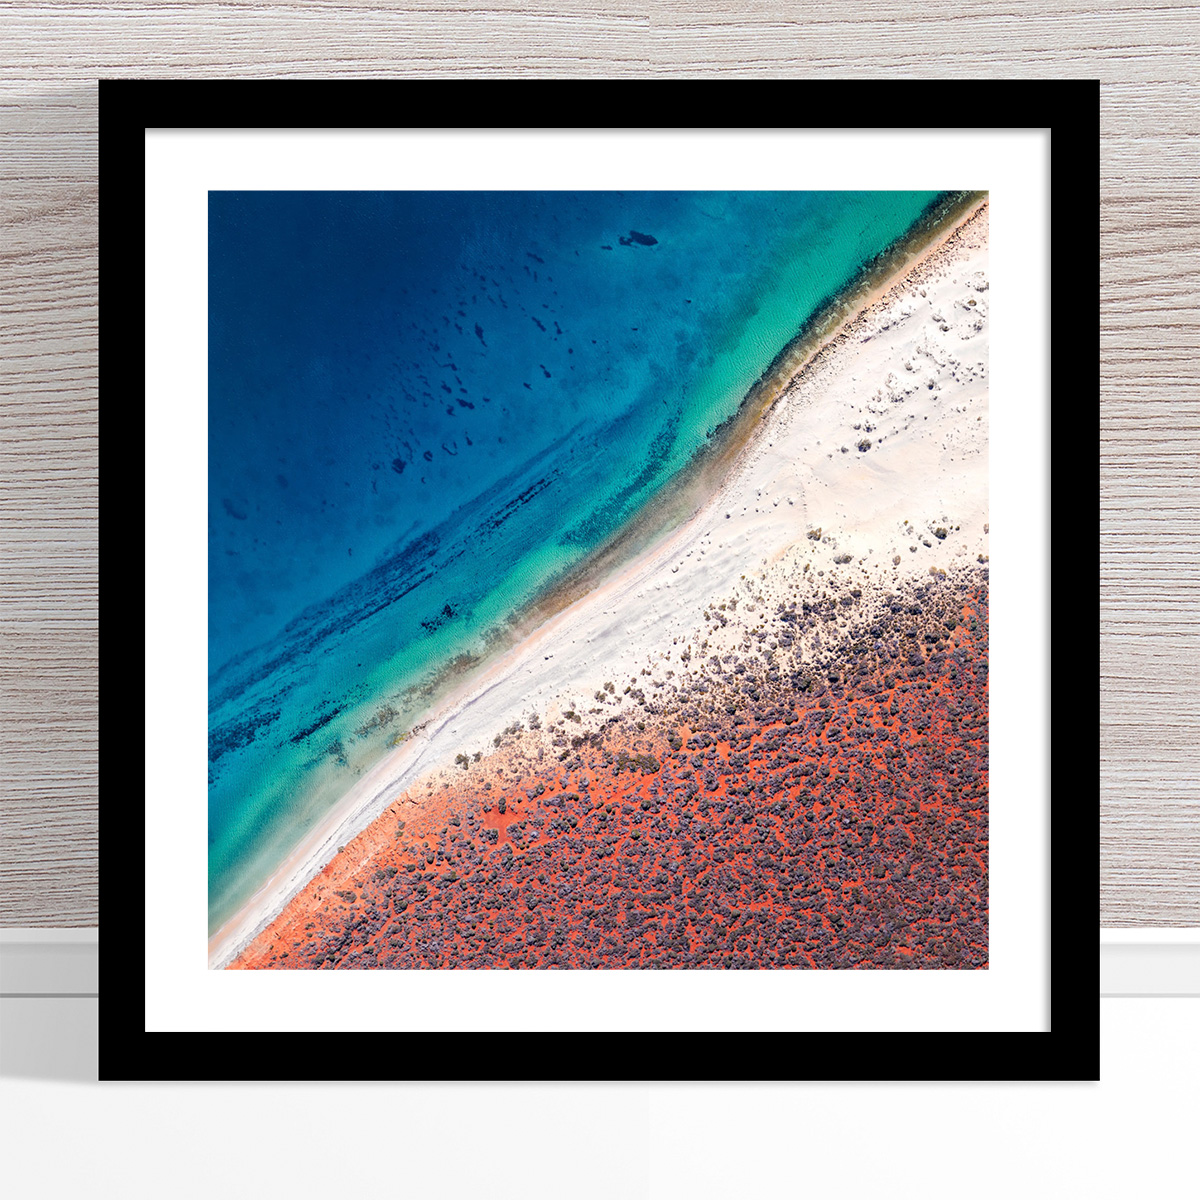 Chris Saunders - 'Aerial Coast 001' Black Frame